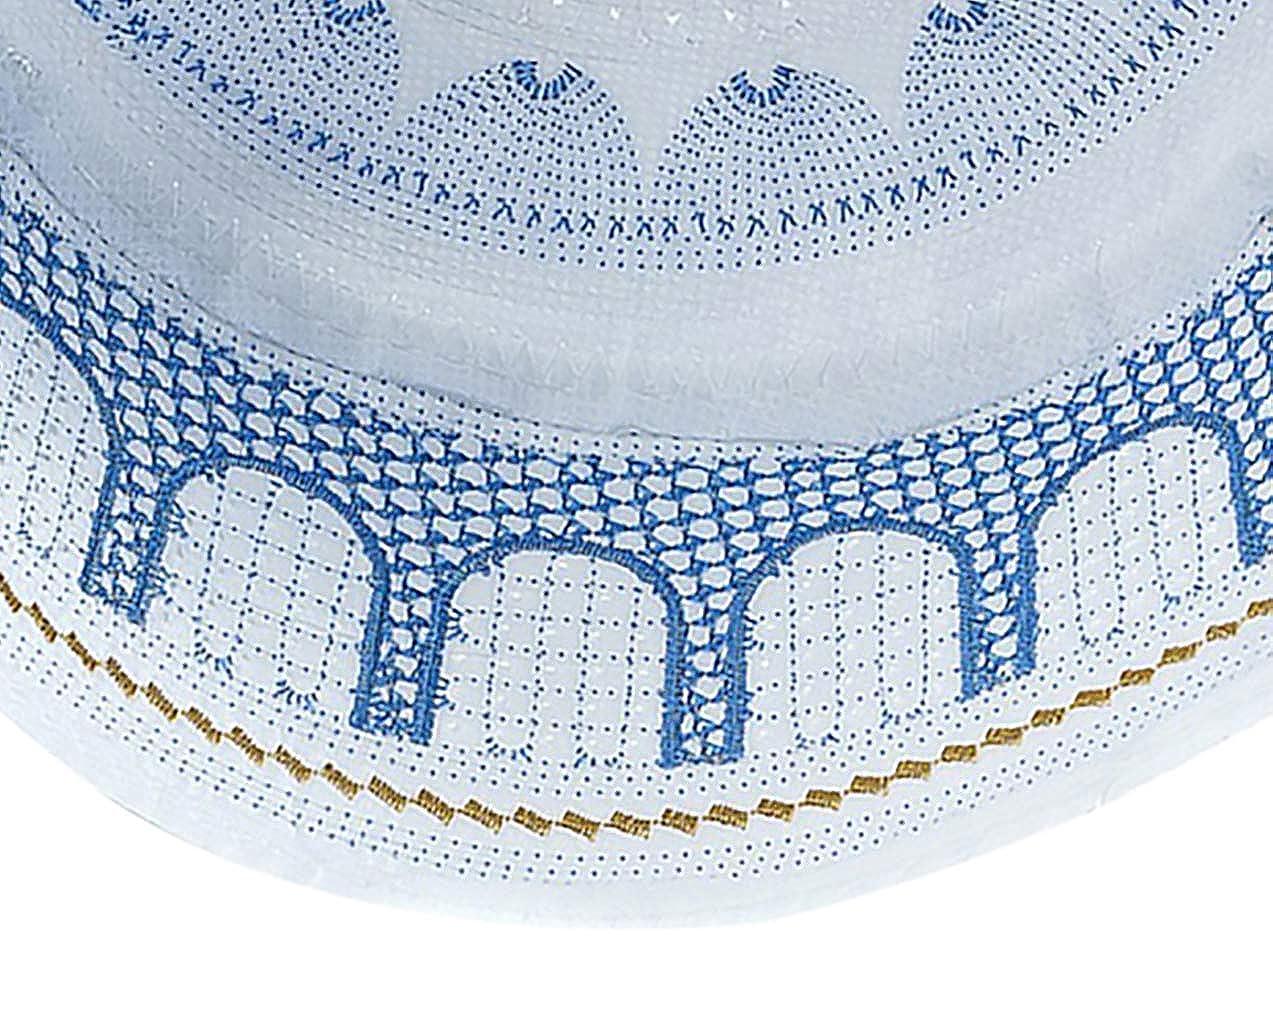 KRUIHAN Musulm/án Sombrero Islam Oraci/ón Headwear Masculino Turco Arabia Hui Ramadan Bordado Cap